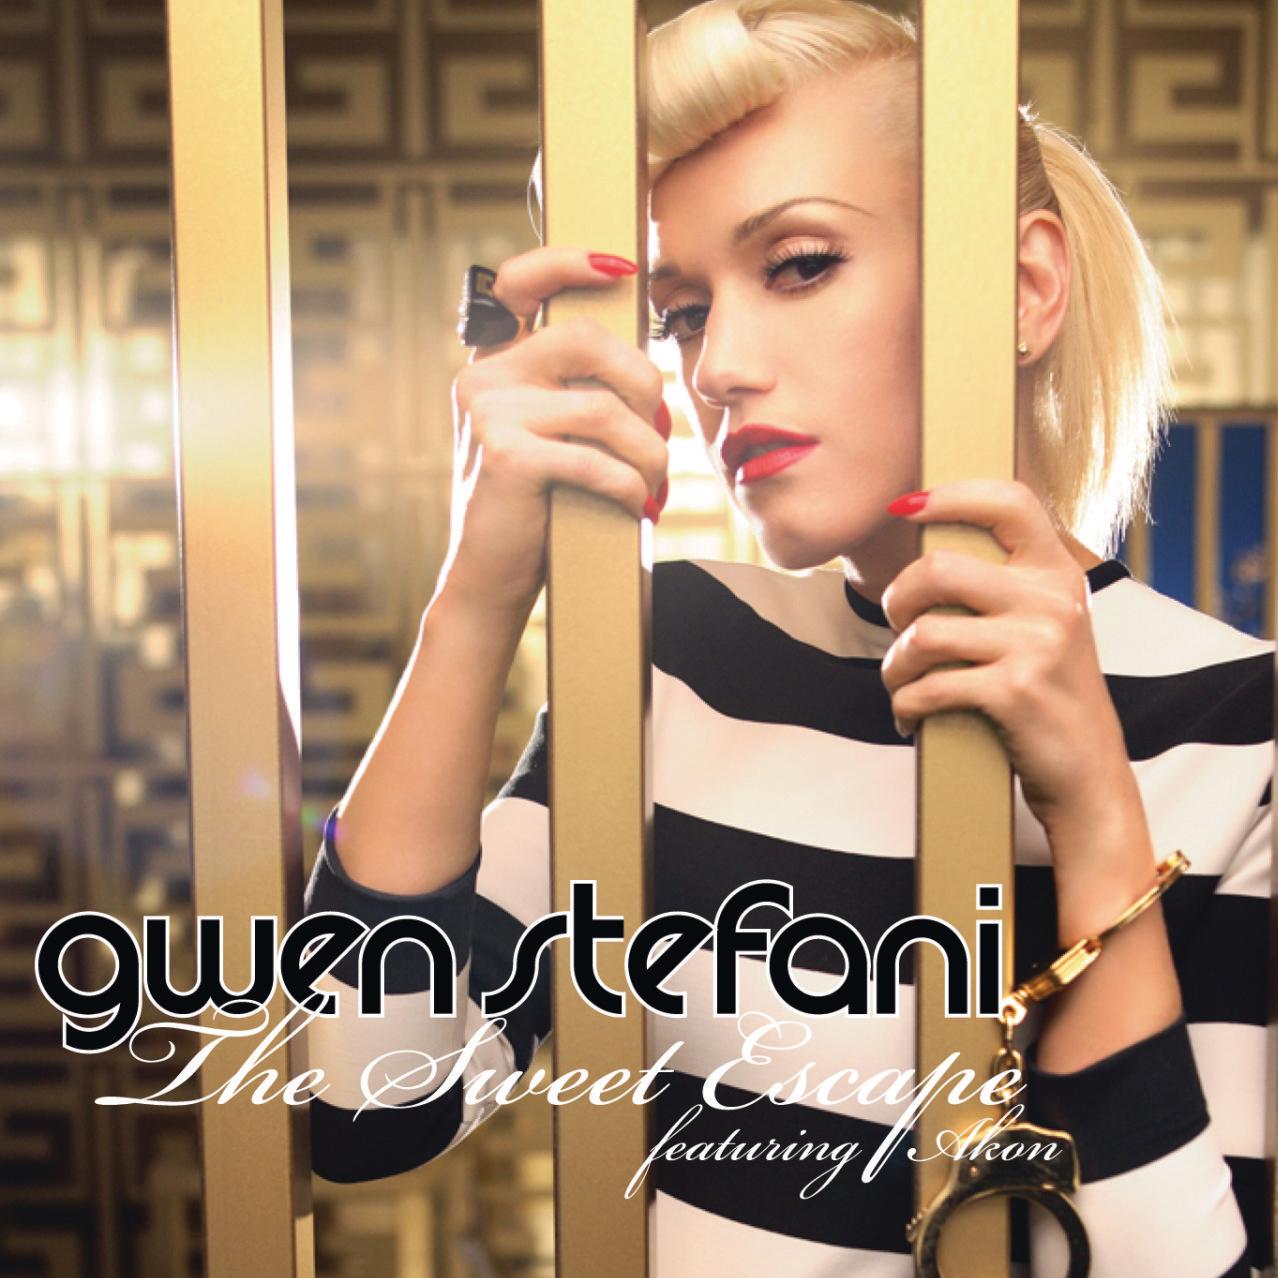 دانلود زیرنویس فارسی فیلم Gwen Stefani Feat. Akon: The Sweet Escape